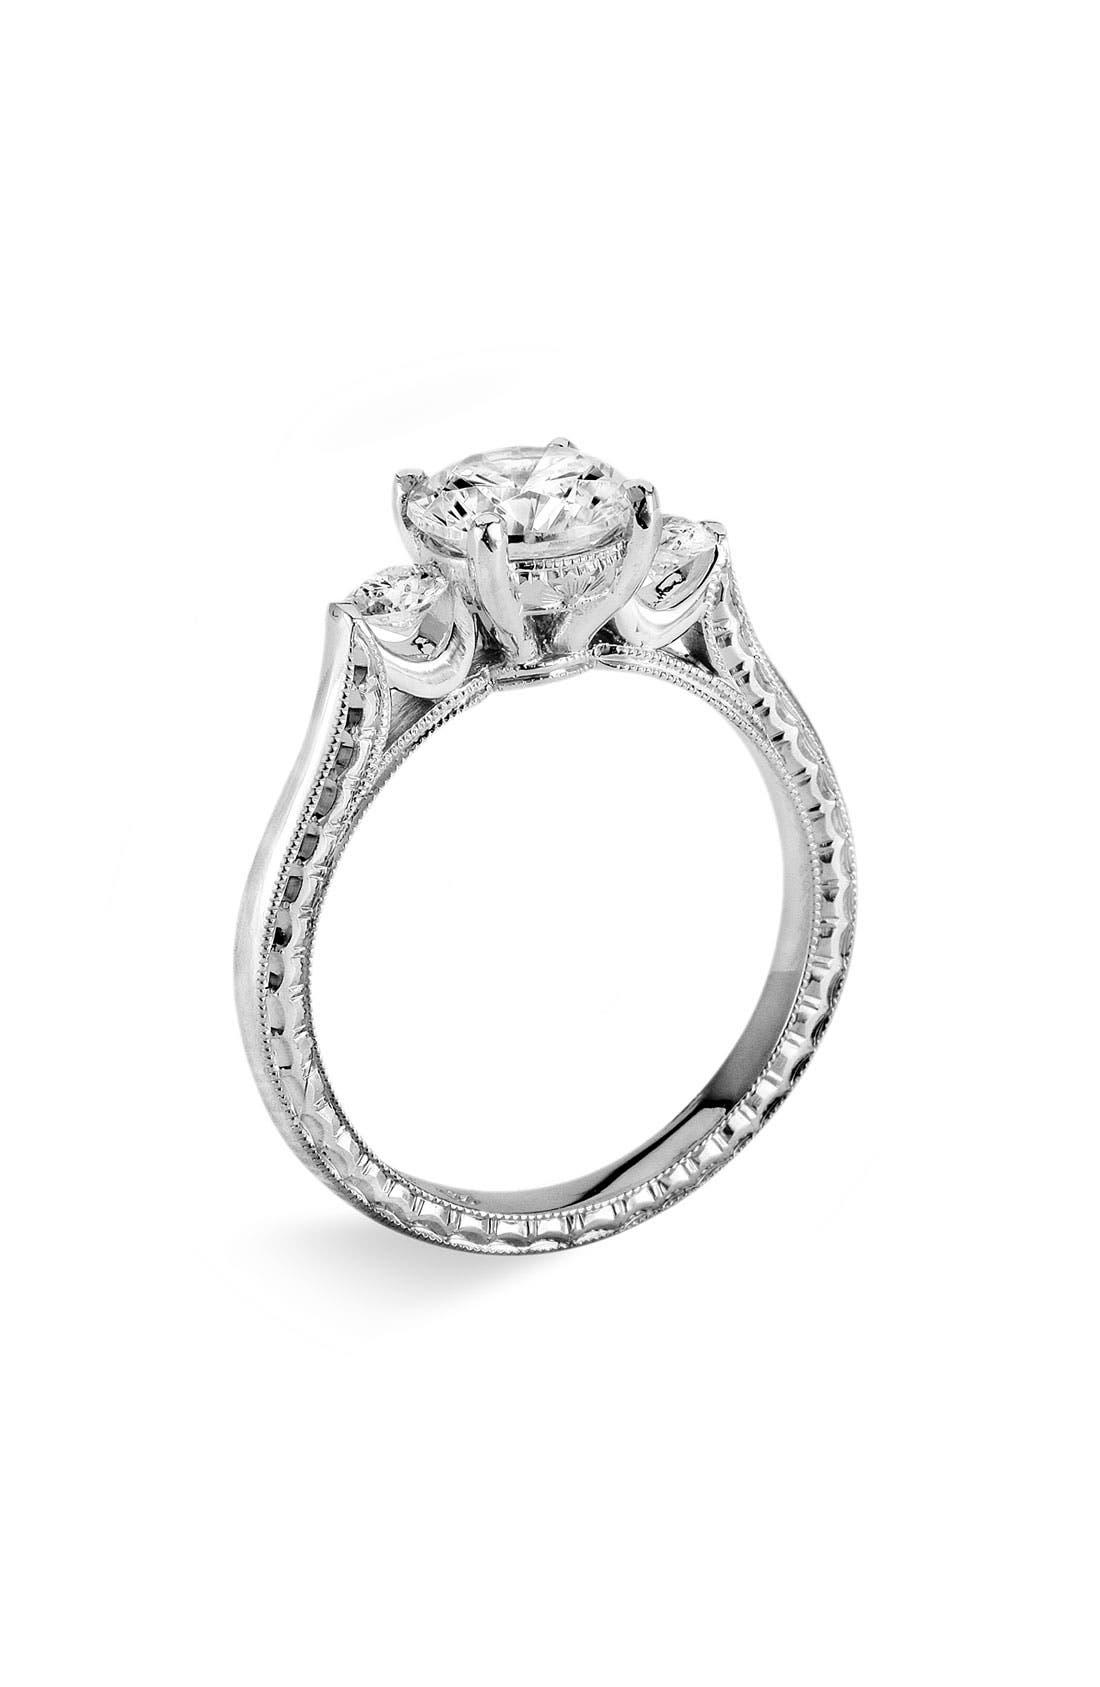 Alternate Image 1 Selected - Jack Kelége 'Silhouette' Platinum 3-Stone Engagement Ring Setting